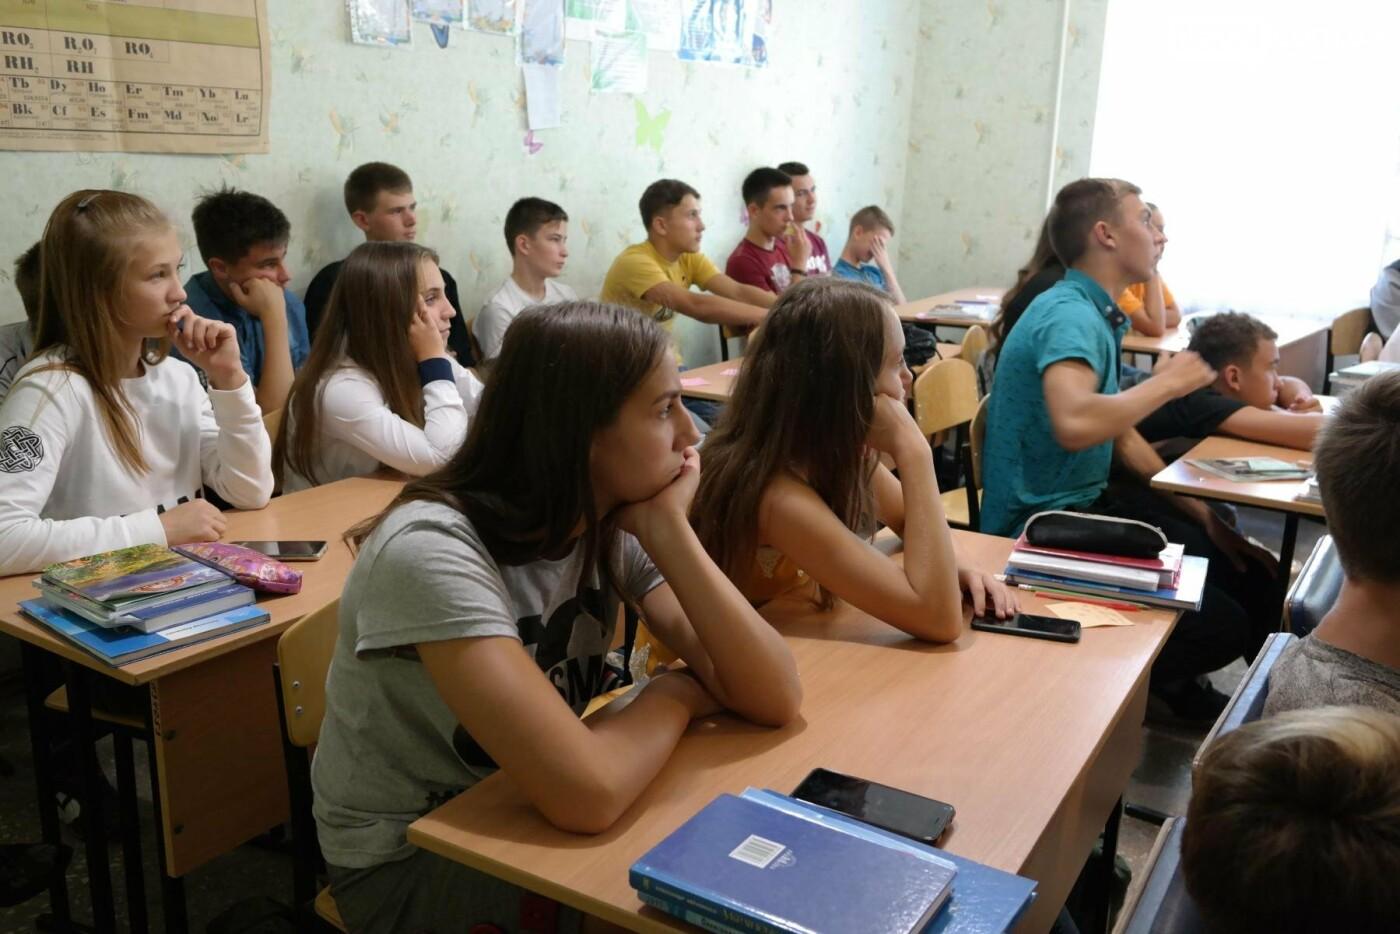 Школьникам Бахмута рассказали о проблеме ВИЧ/СПИД , фото-2